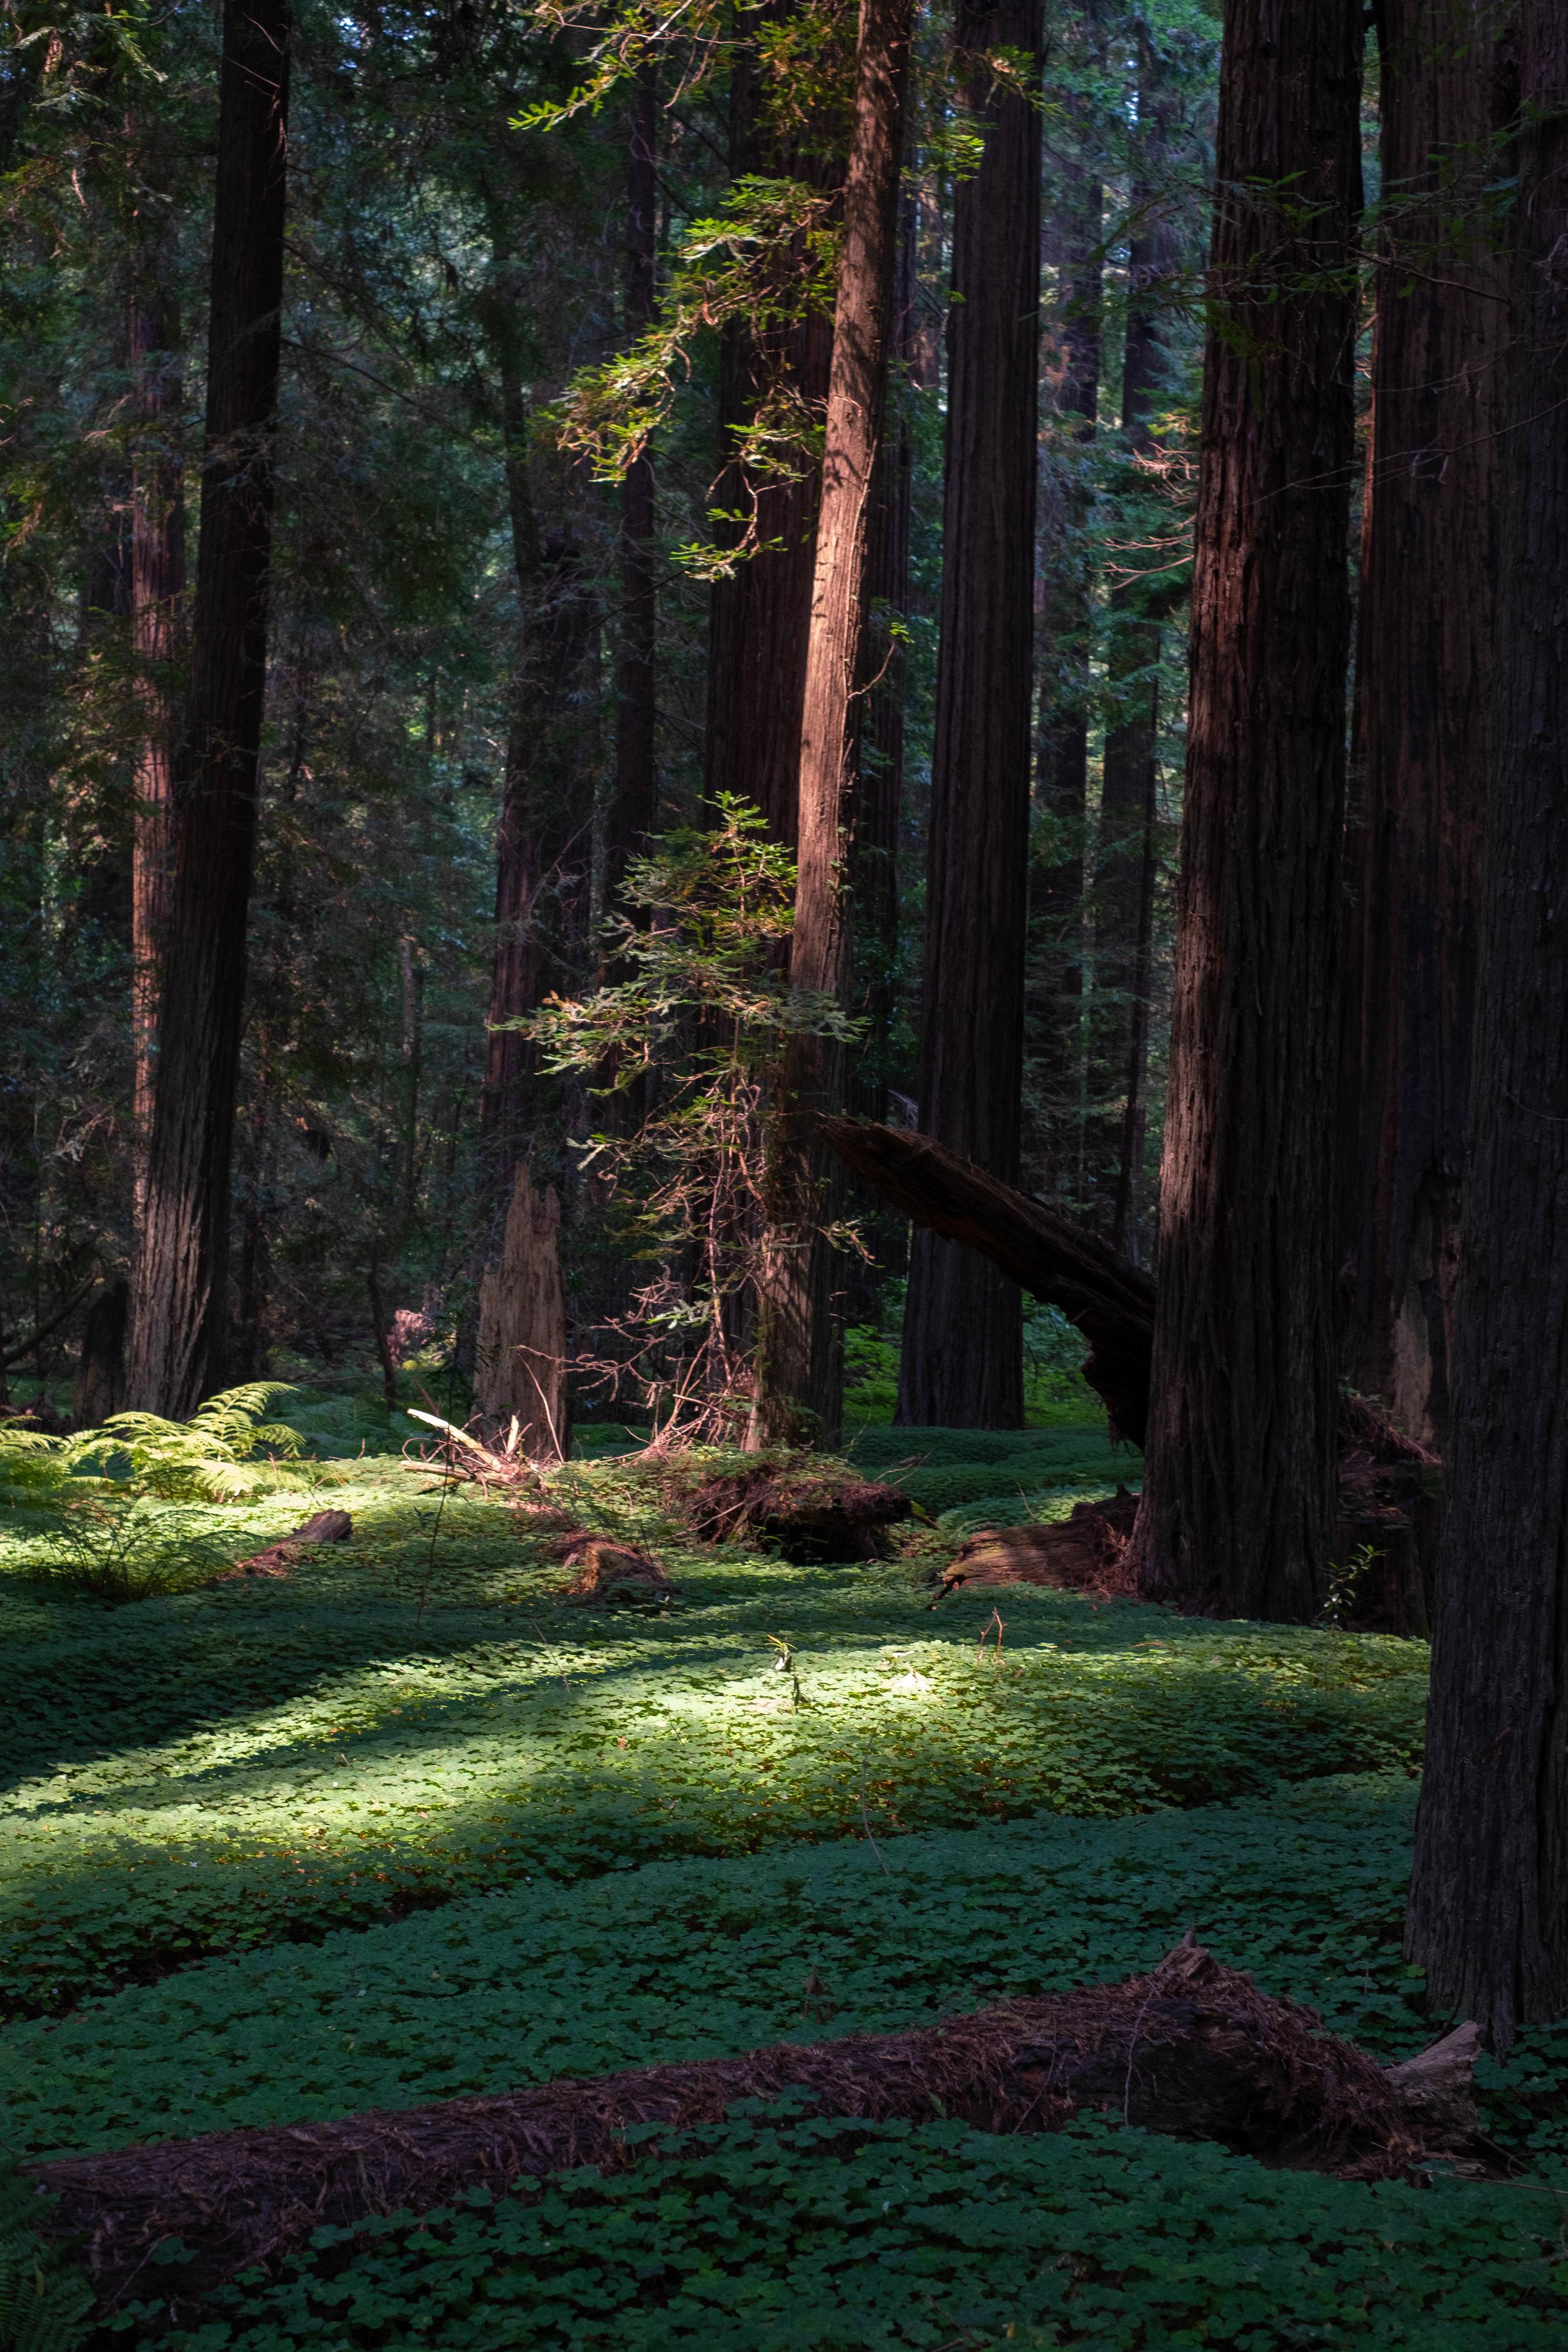 Humbolt Redwoods State Park | Jakee zaccor | jzaccor designs